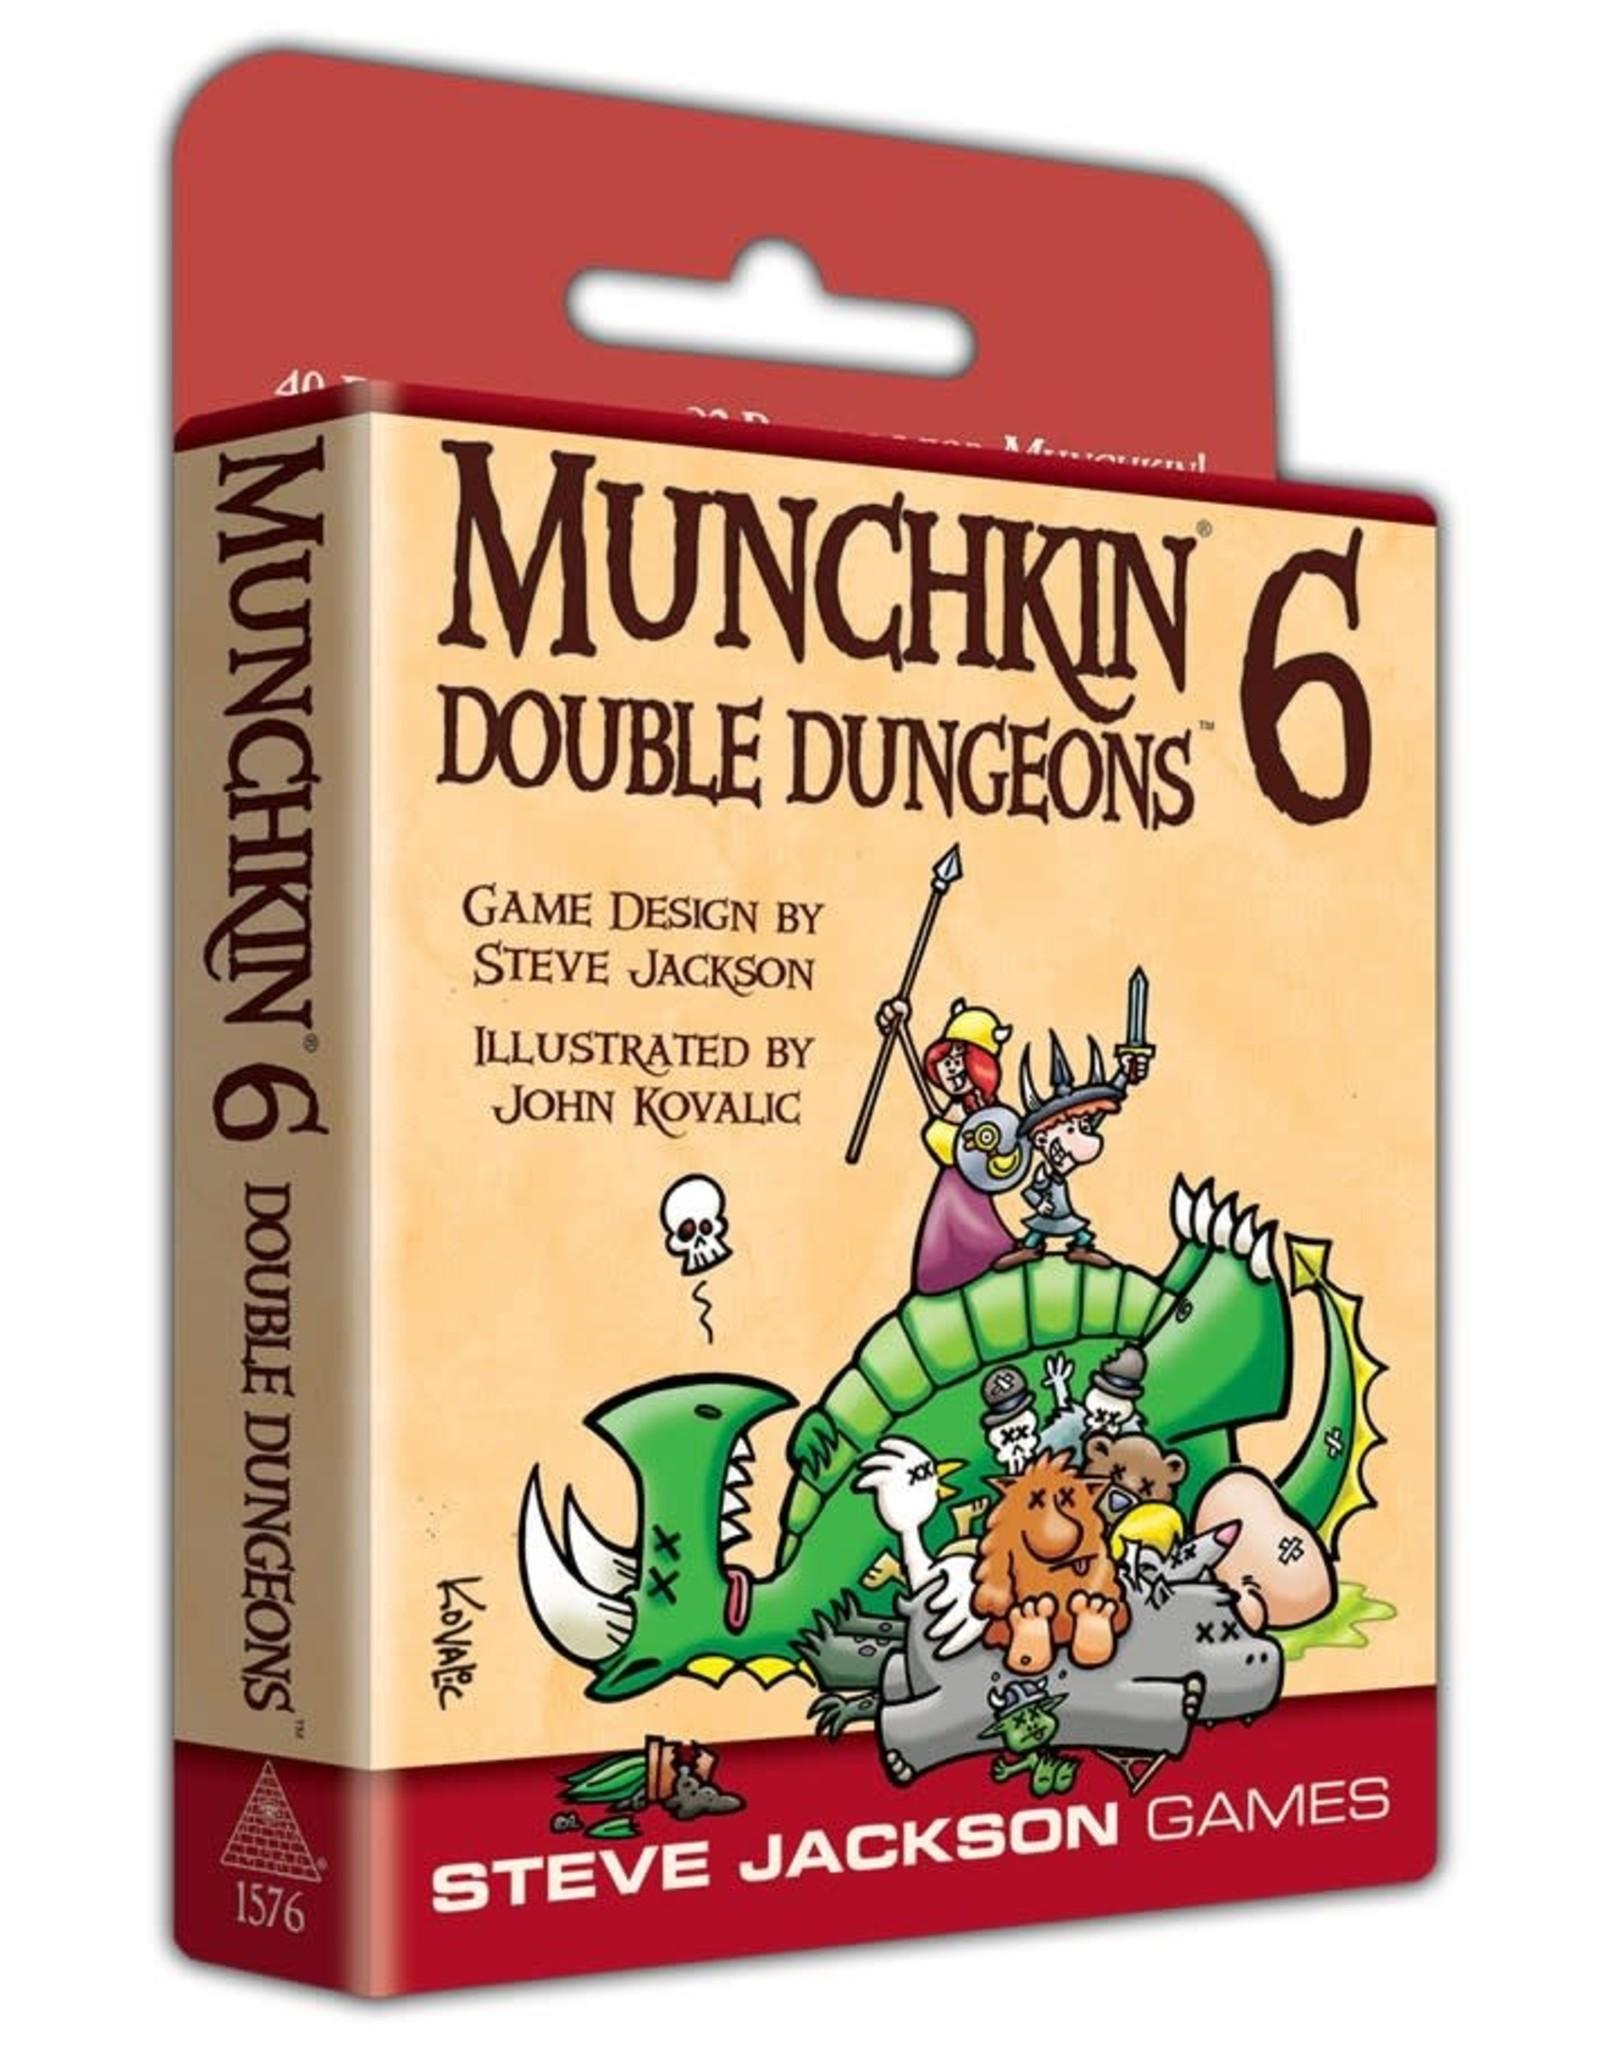 Steve Jackson Games Munchkin 6 Double Dungeons